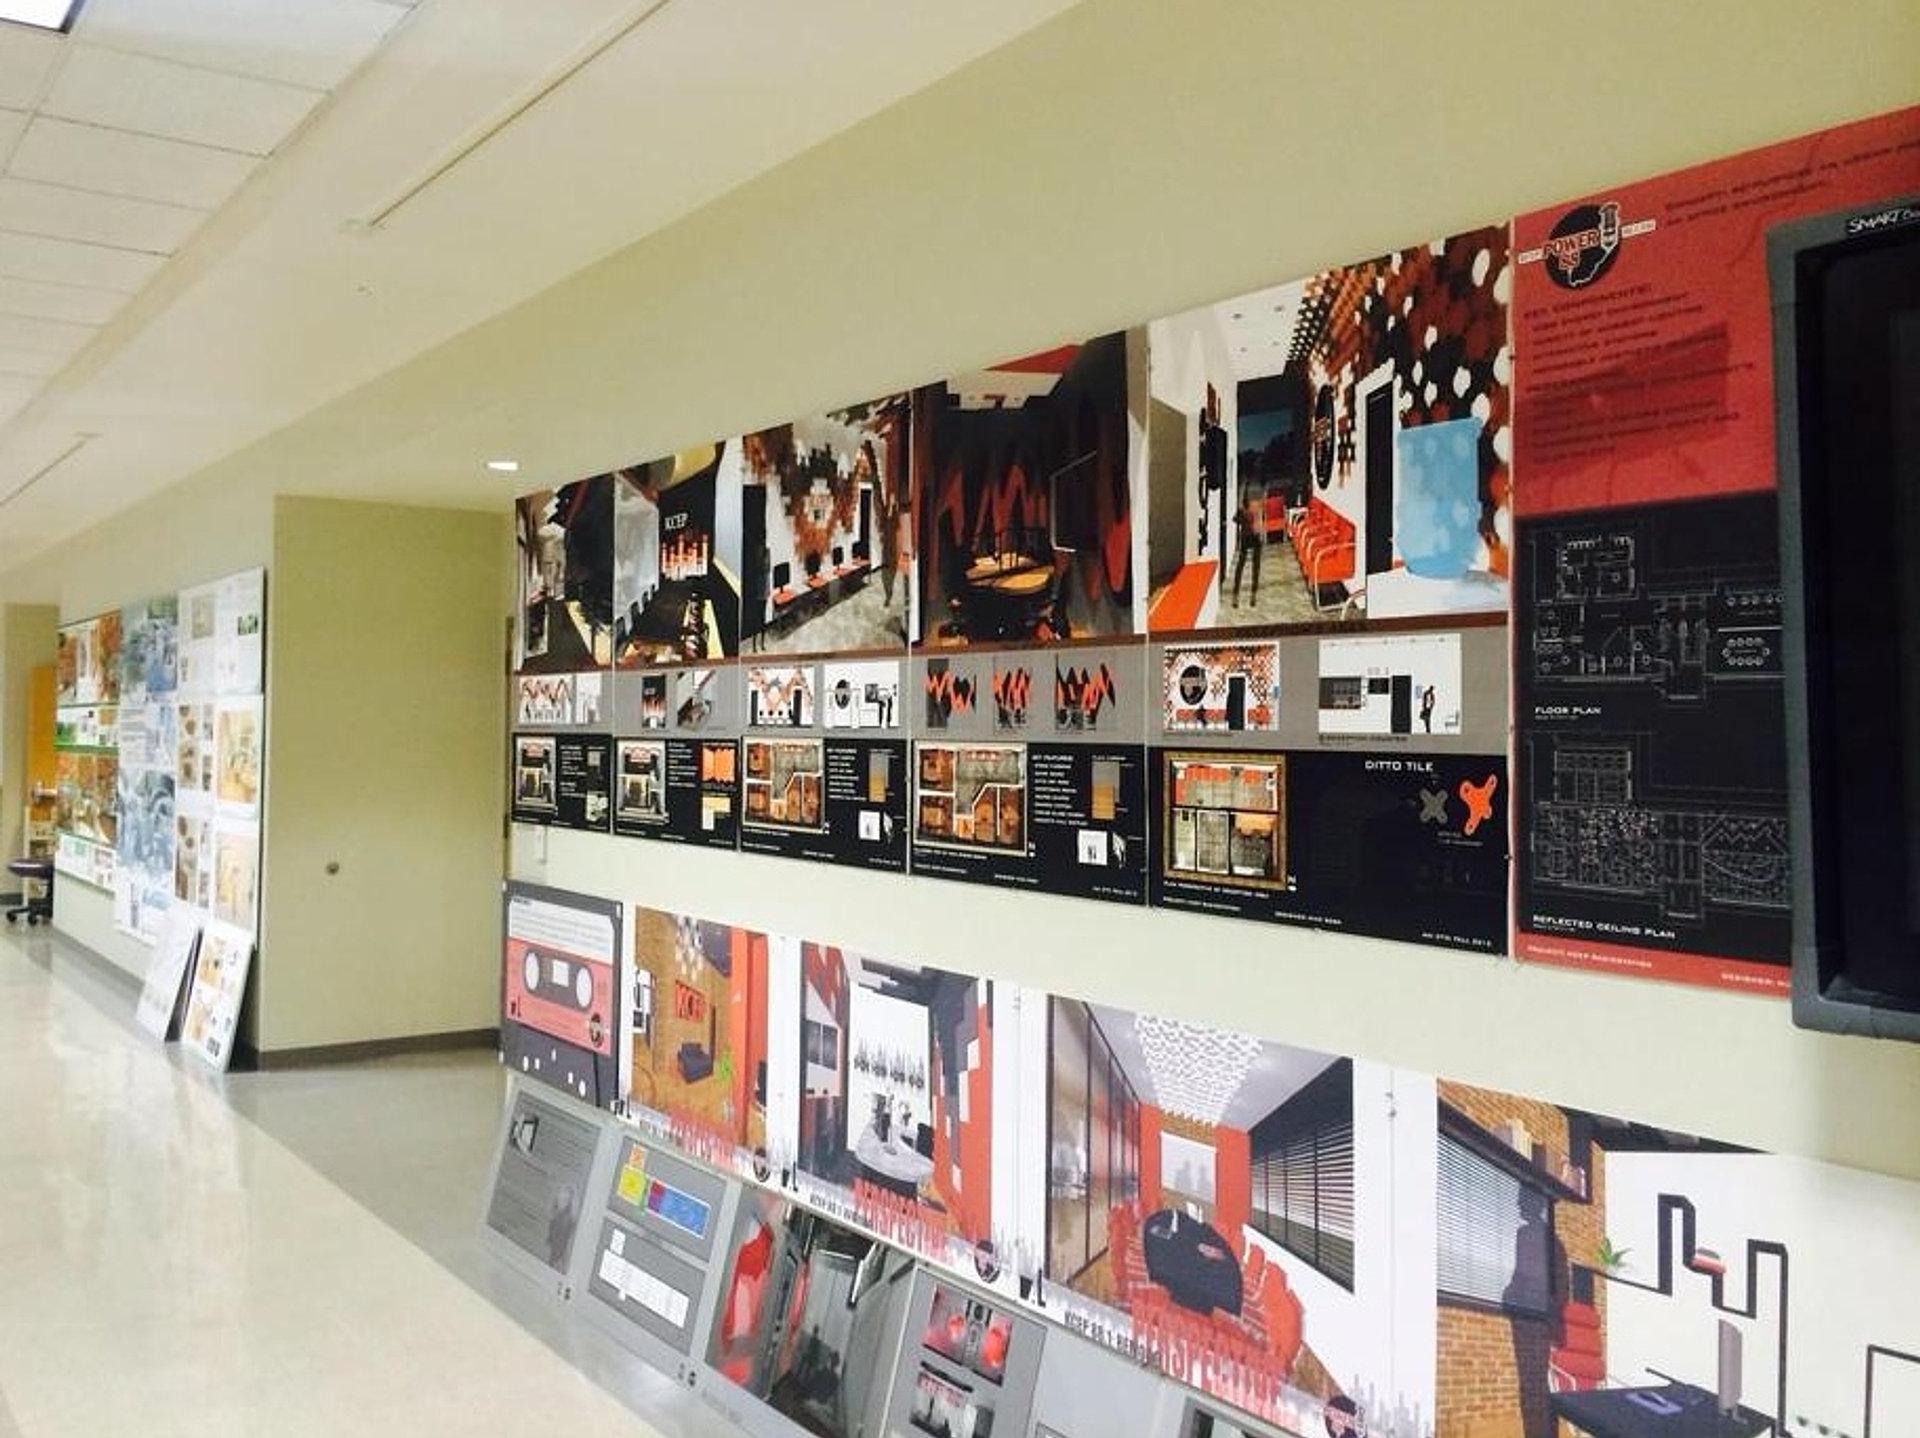 University of Nevada Las Vegas Interior Architecture and Design